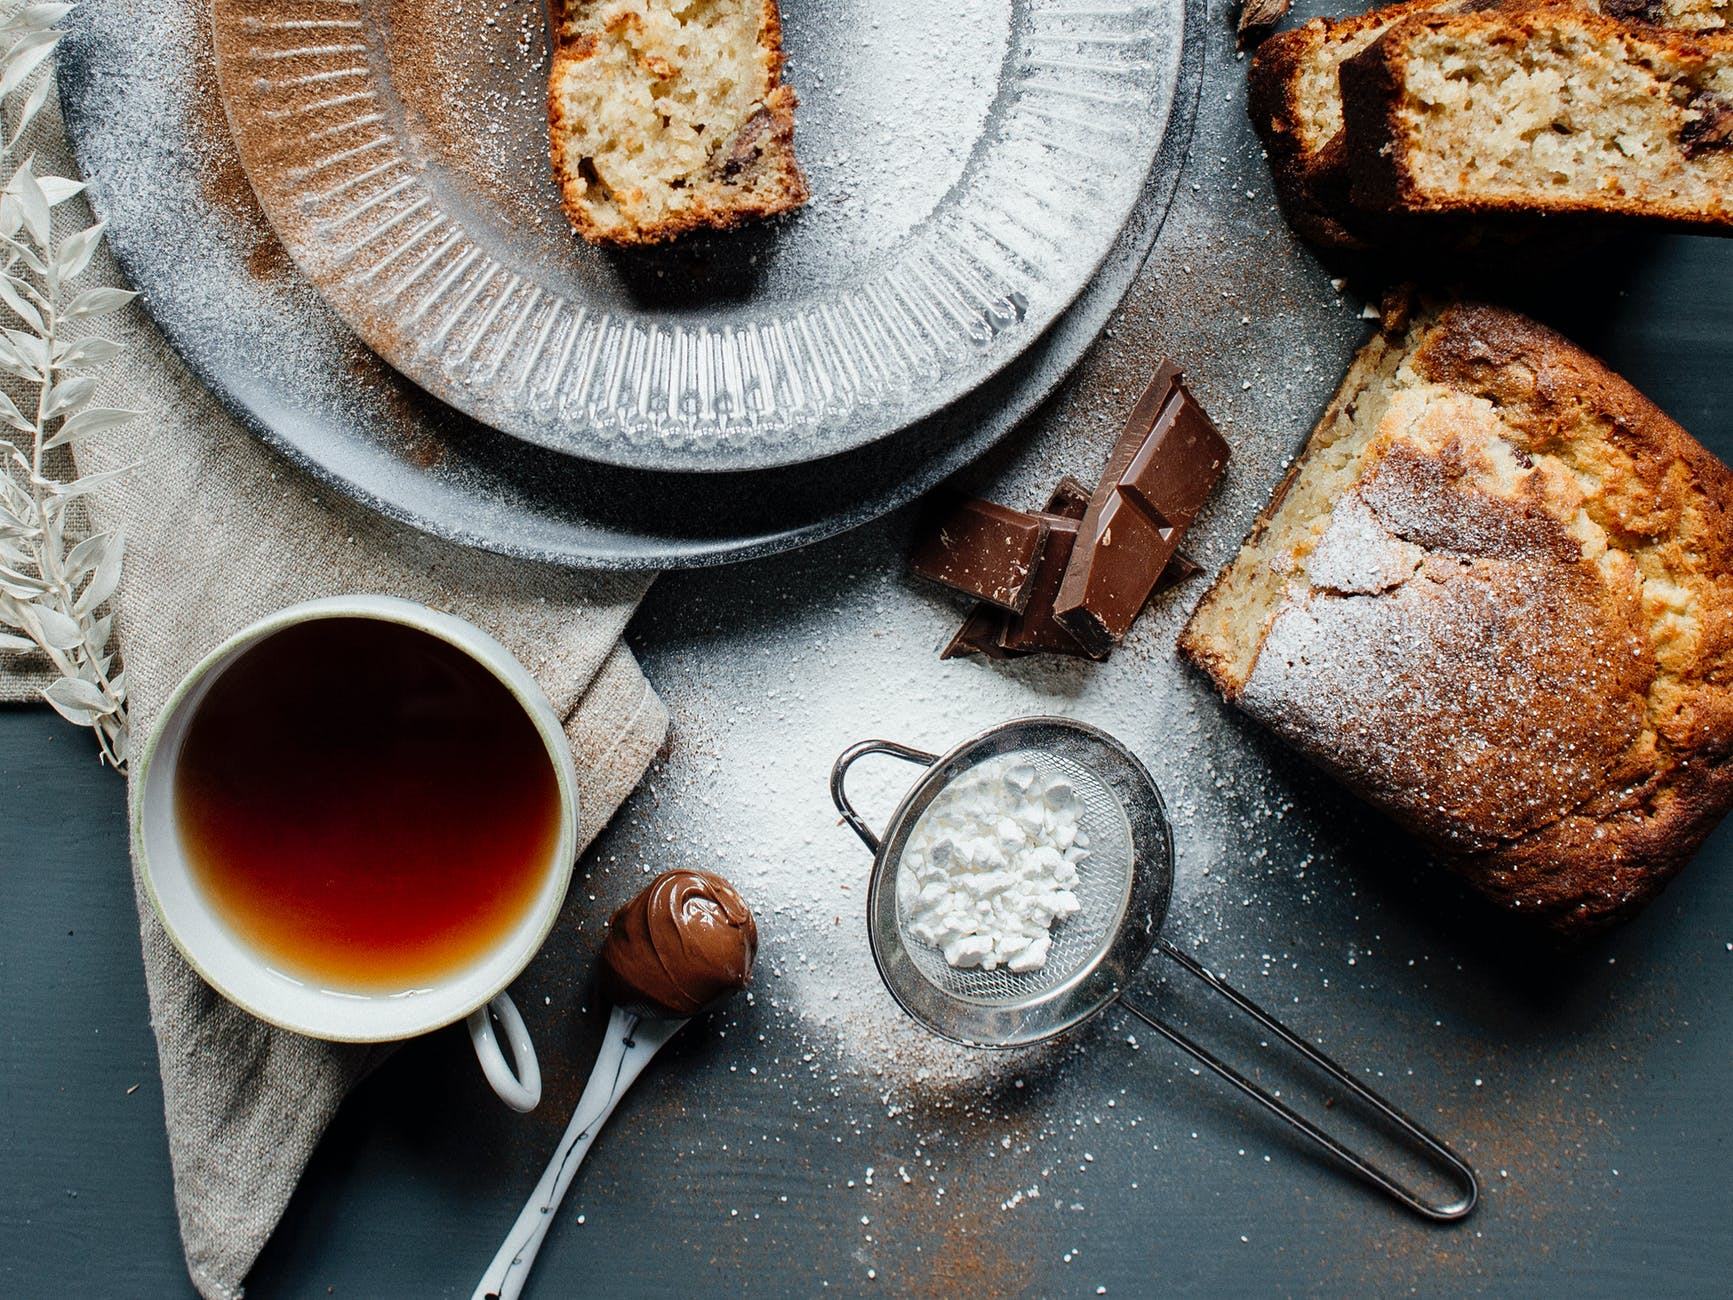 Reteta delicioasa de banana bread. Un desert rapid, aromat, care ti se topeste in gura!